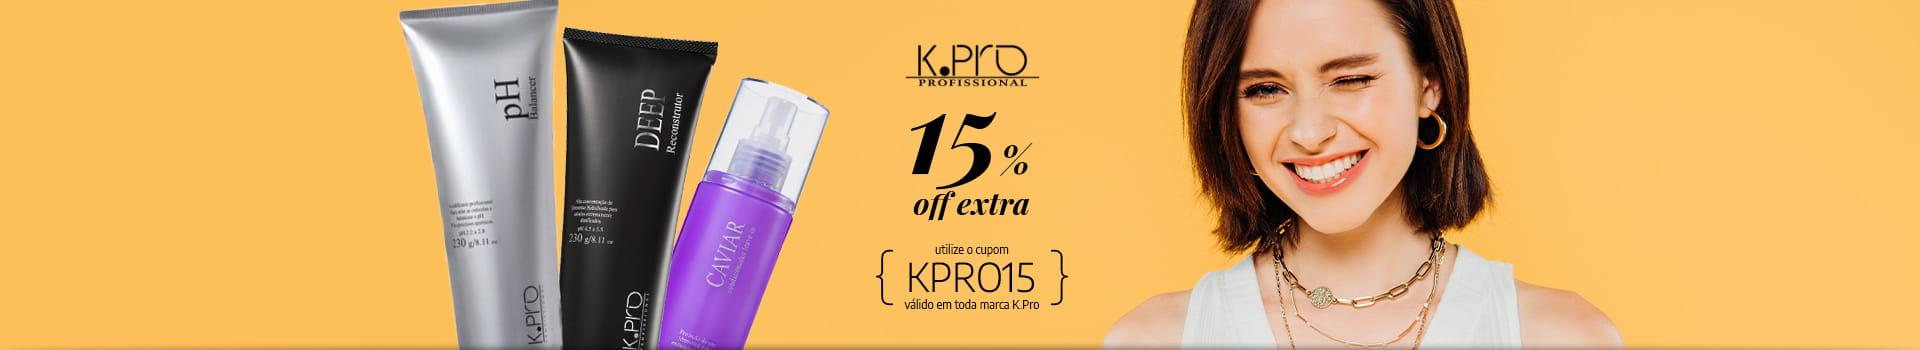 K.pro 15% off extra